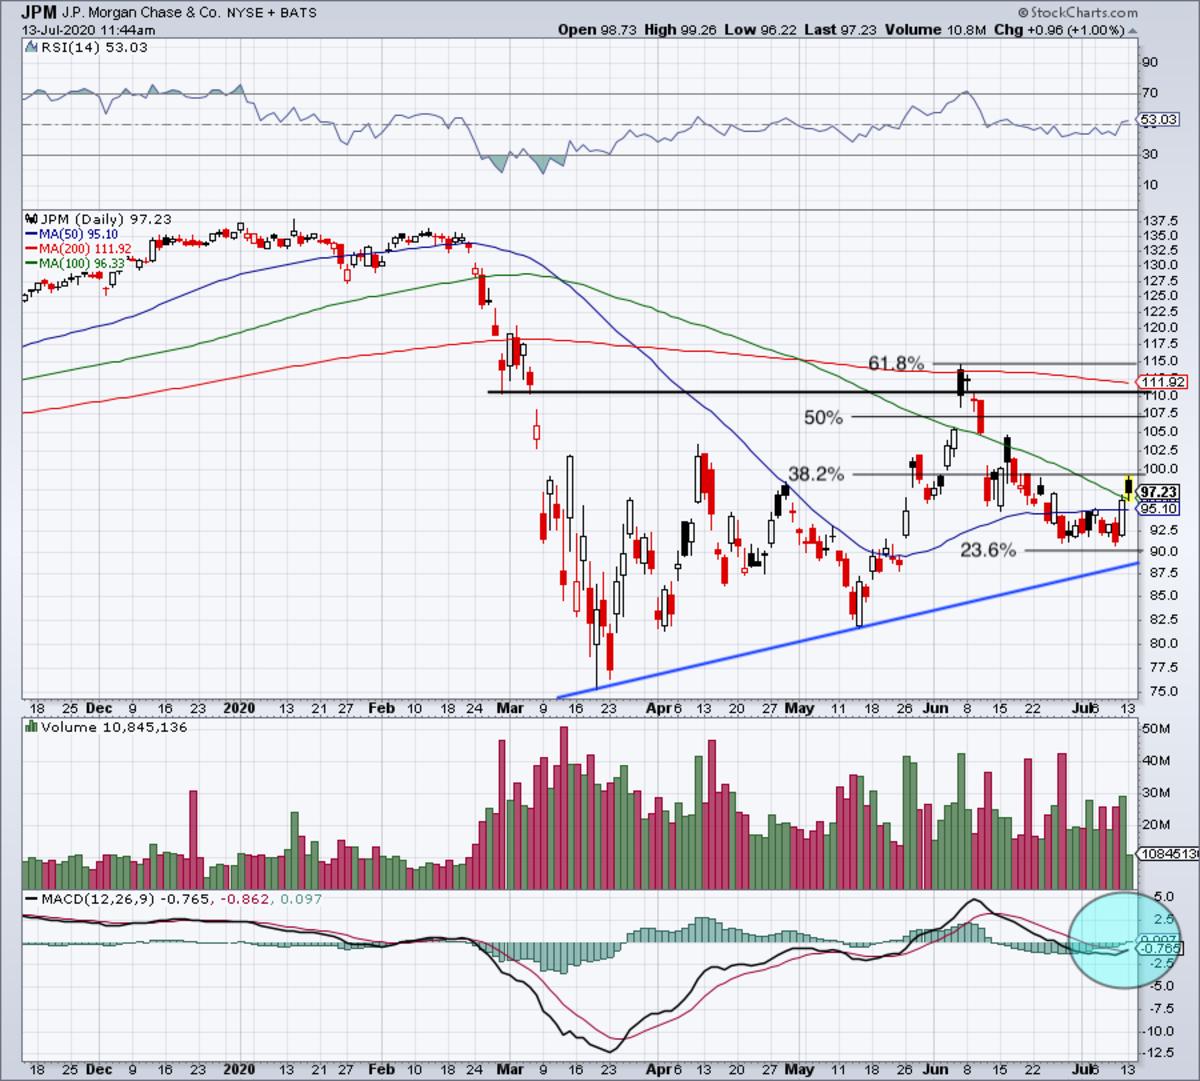 Daily chart of JPMorgan stock.